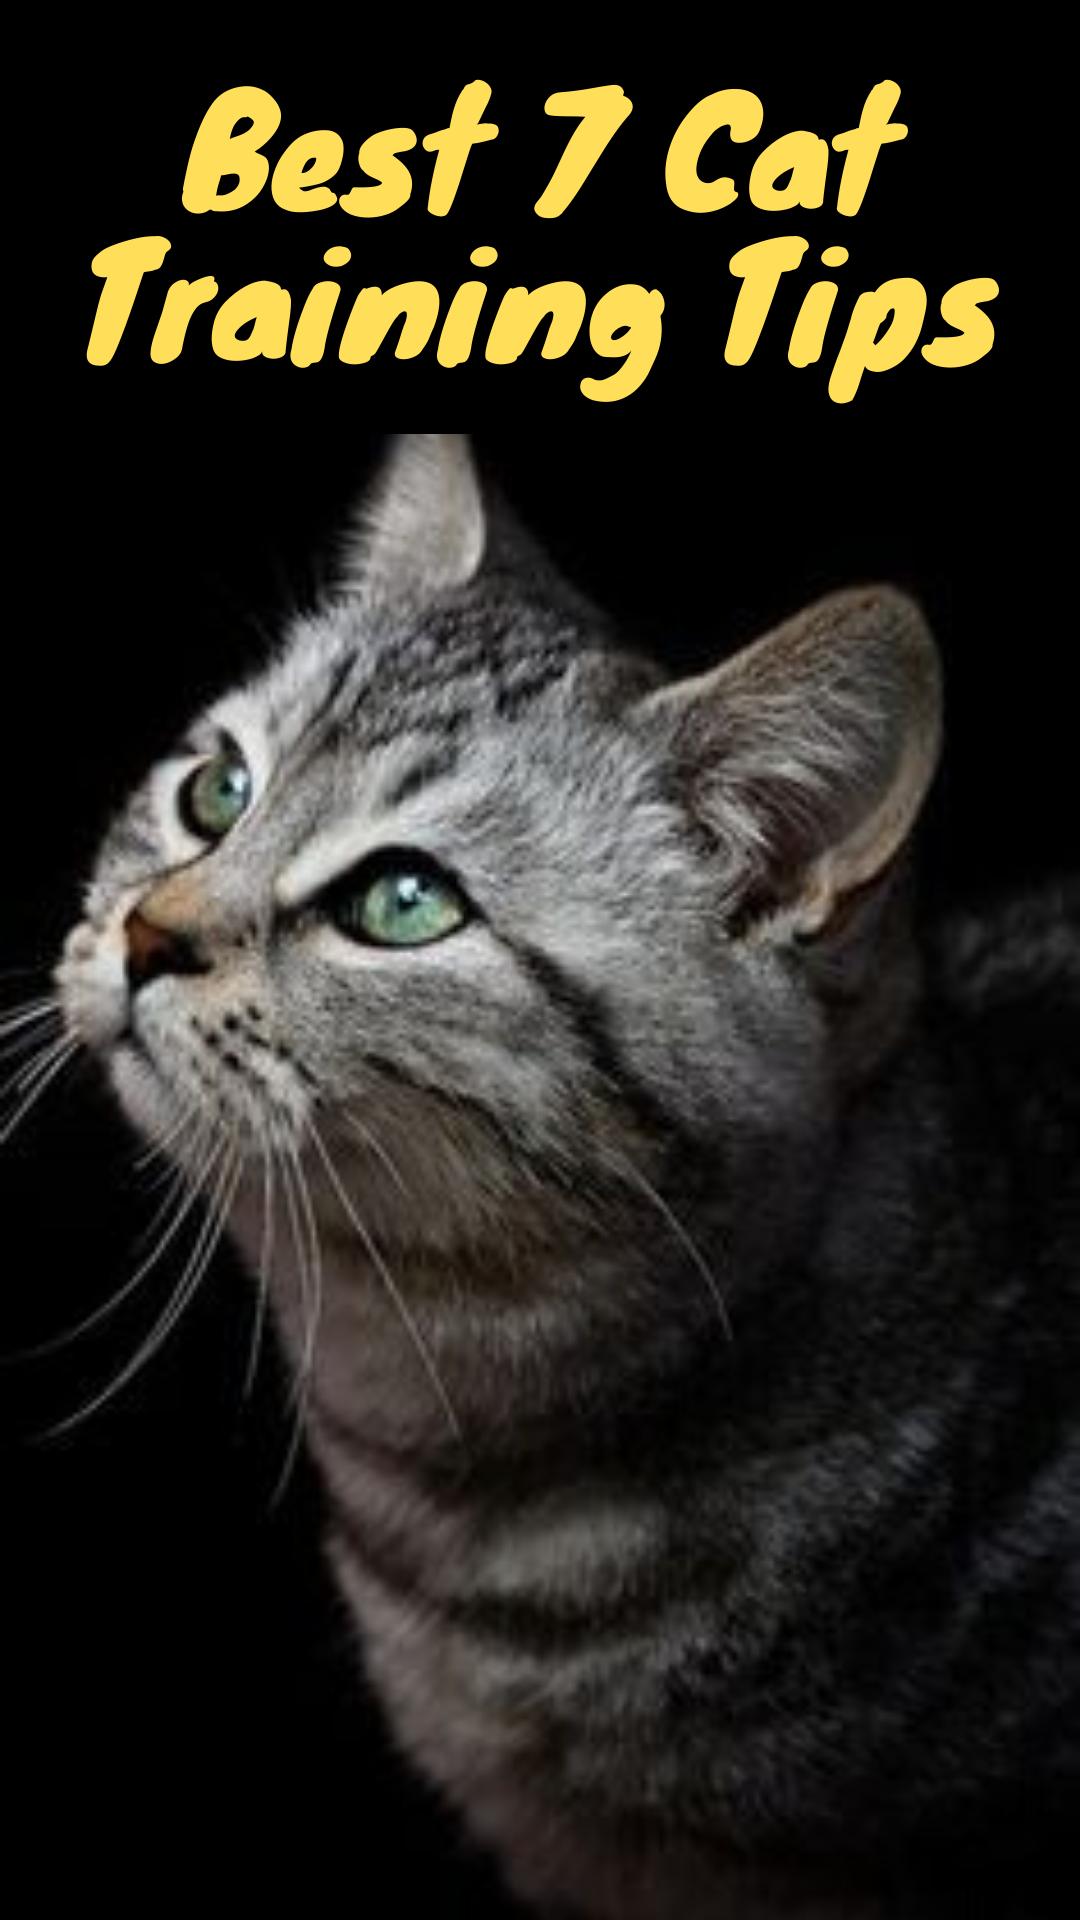 Best 7 Cat Training Tips In 2020 Cats Cat Training Funny Cat Memes